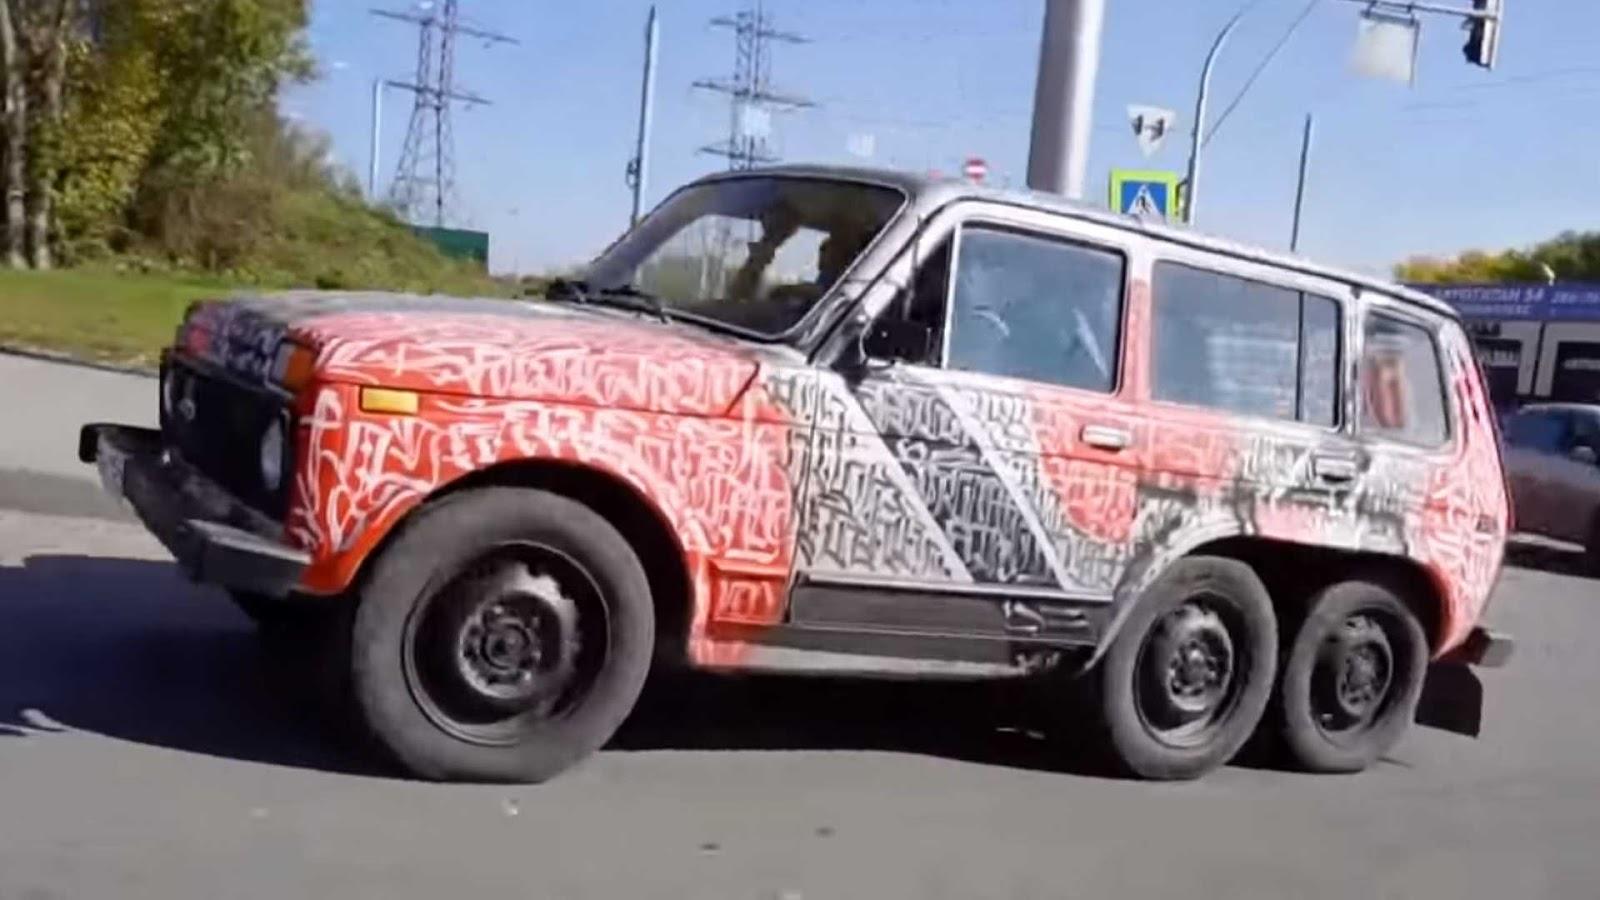 LADA2 Αυτο το Lada Niva είναι το... 6Χ6 του φτωχού 6X6, Fun, Lada, Offroad, SUV, video, videos, zblog